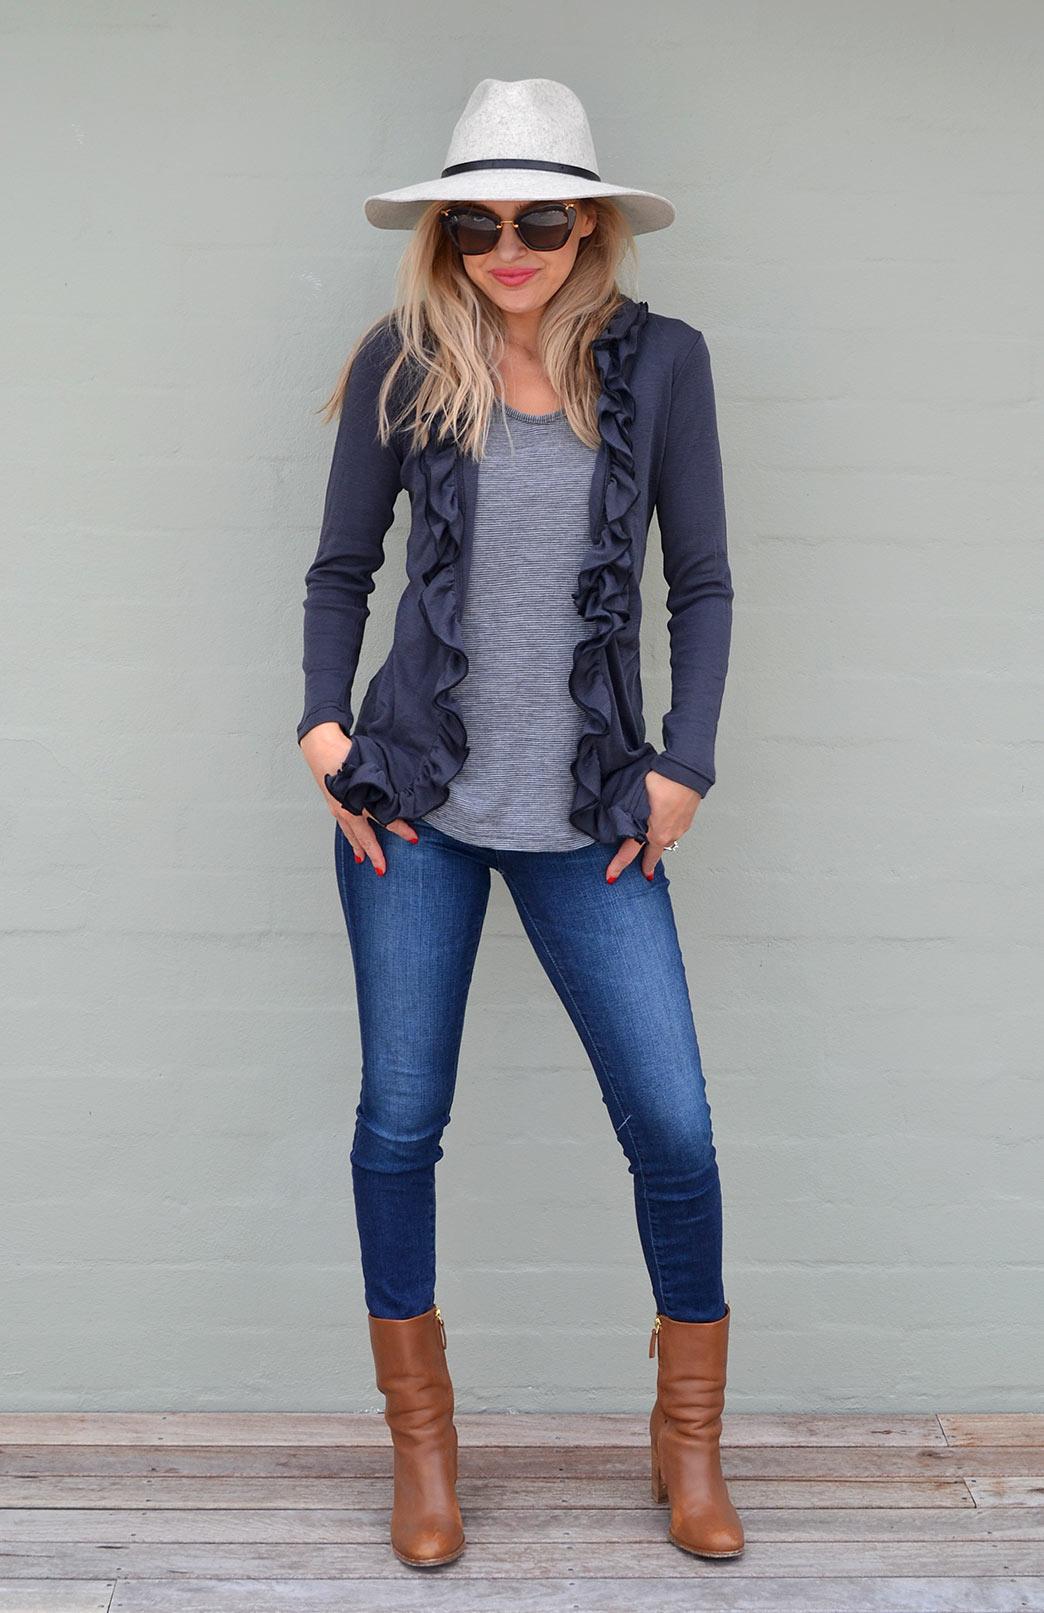 Ruffled Cardigan - Women's Classic Straight Dark Grey Steel Wool Cardigan with Ruffled Neckline - Smitten Merino Tasmania Australia